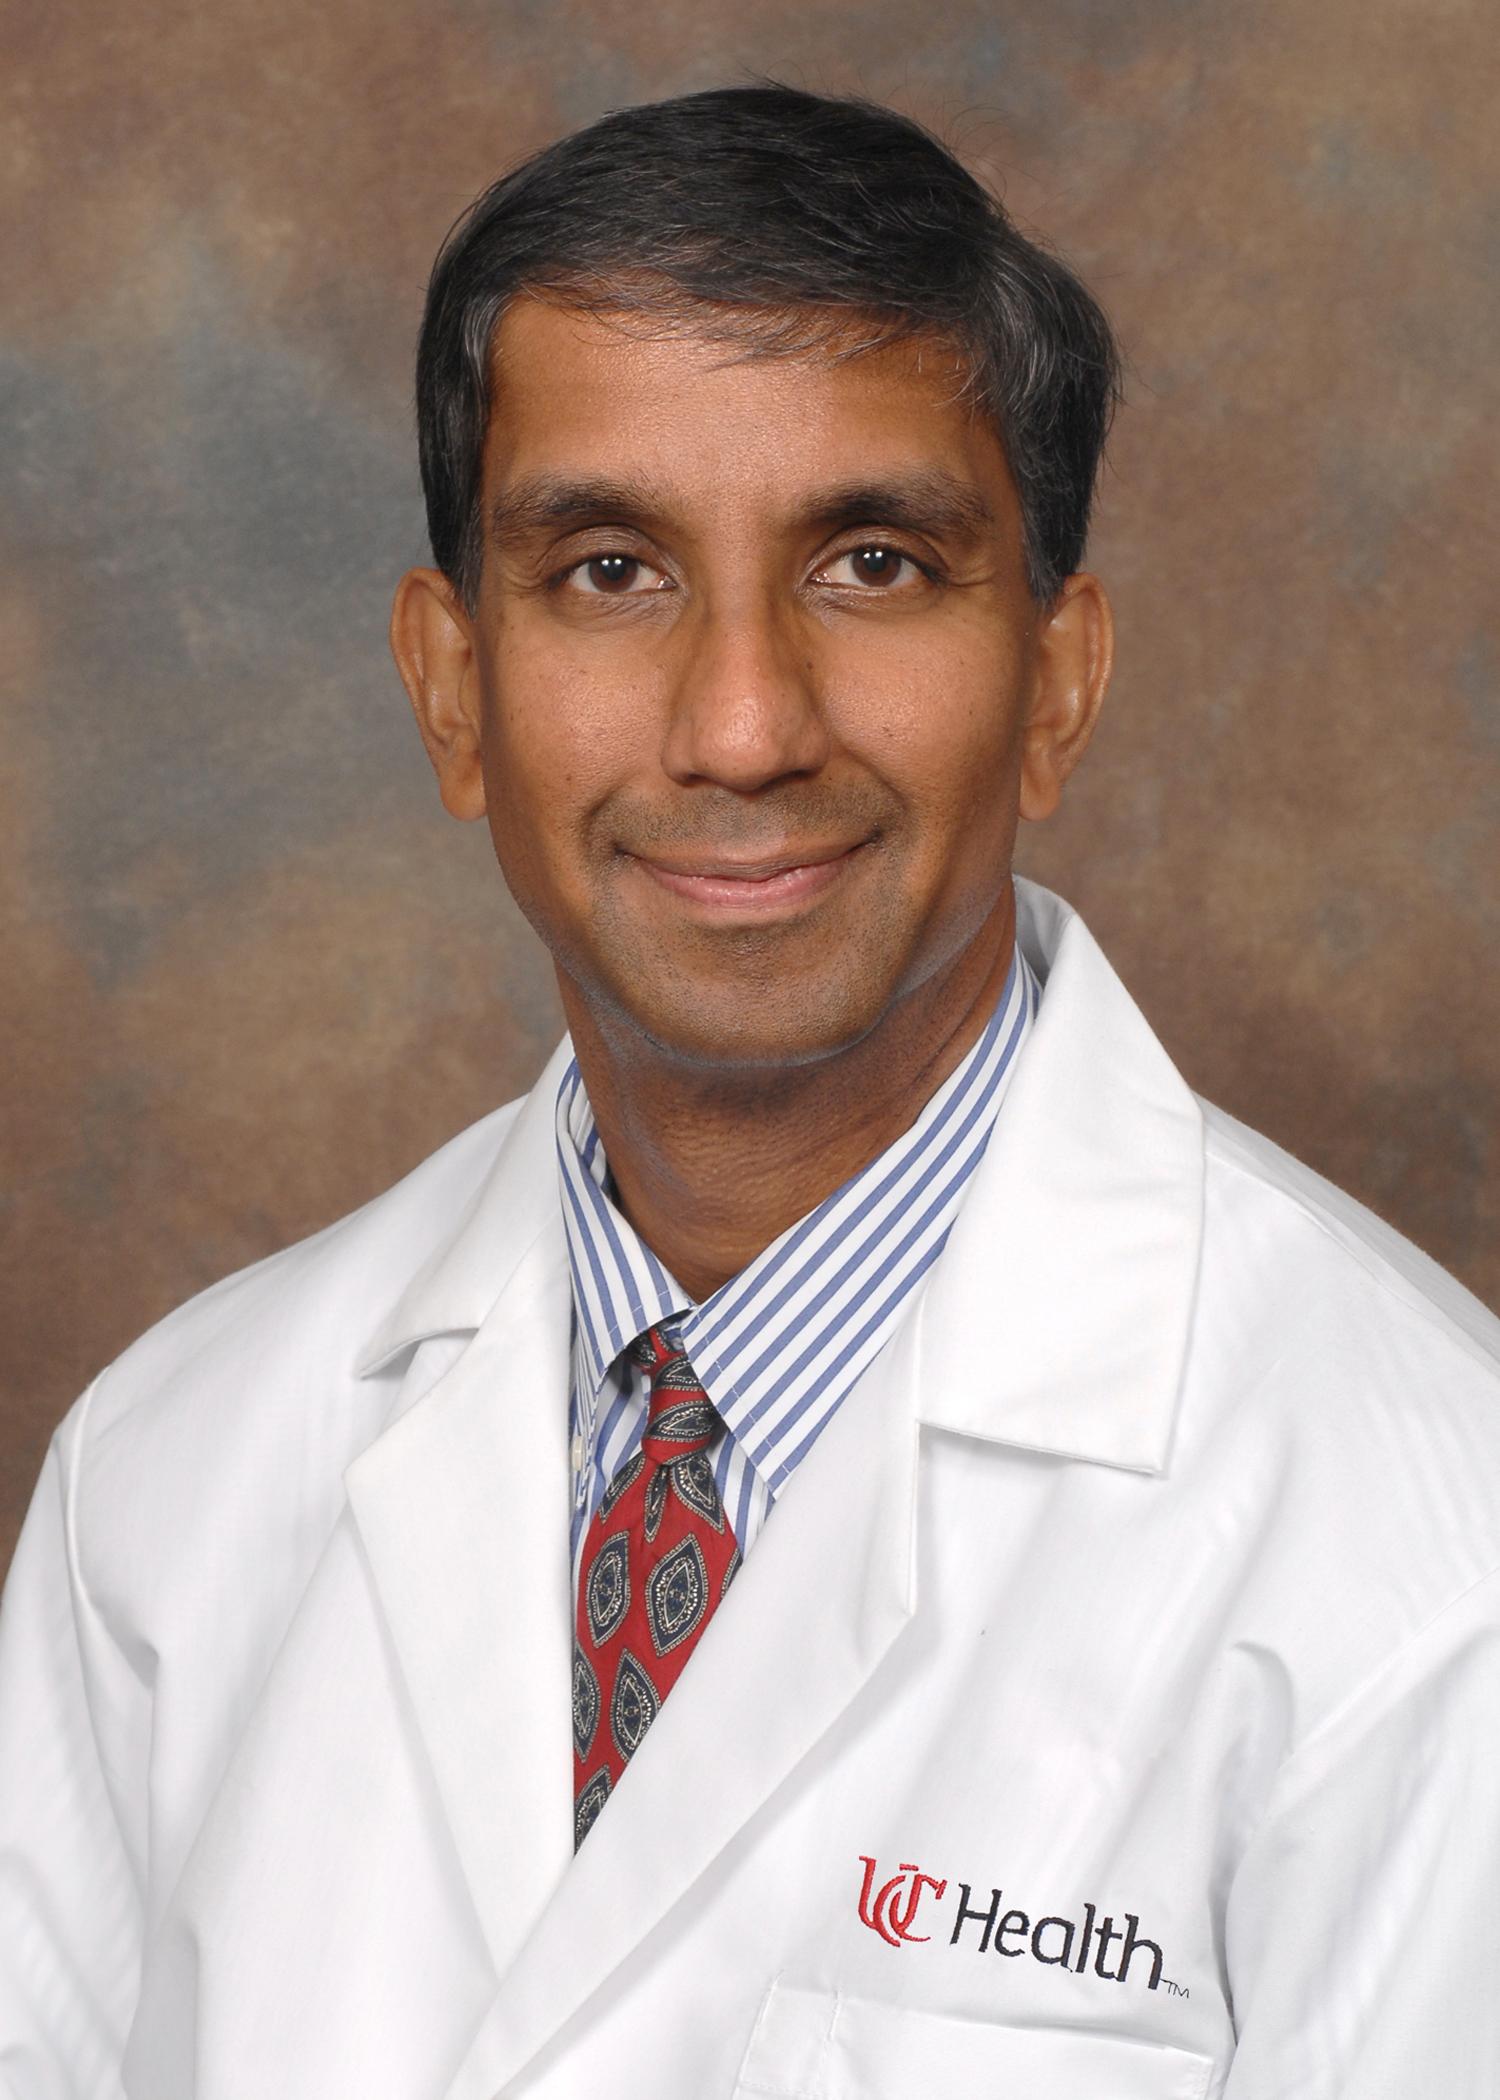 Photo of Ravi Samy, M.D.